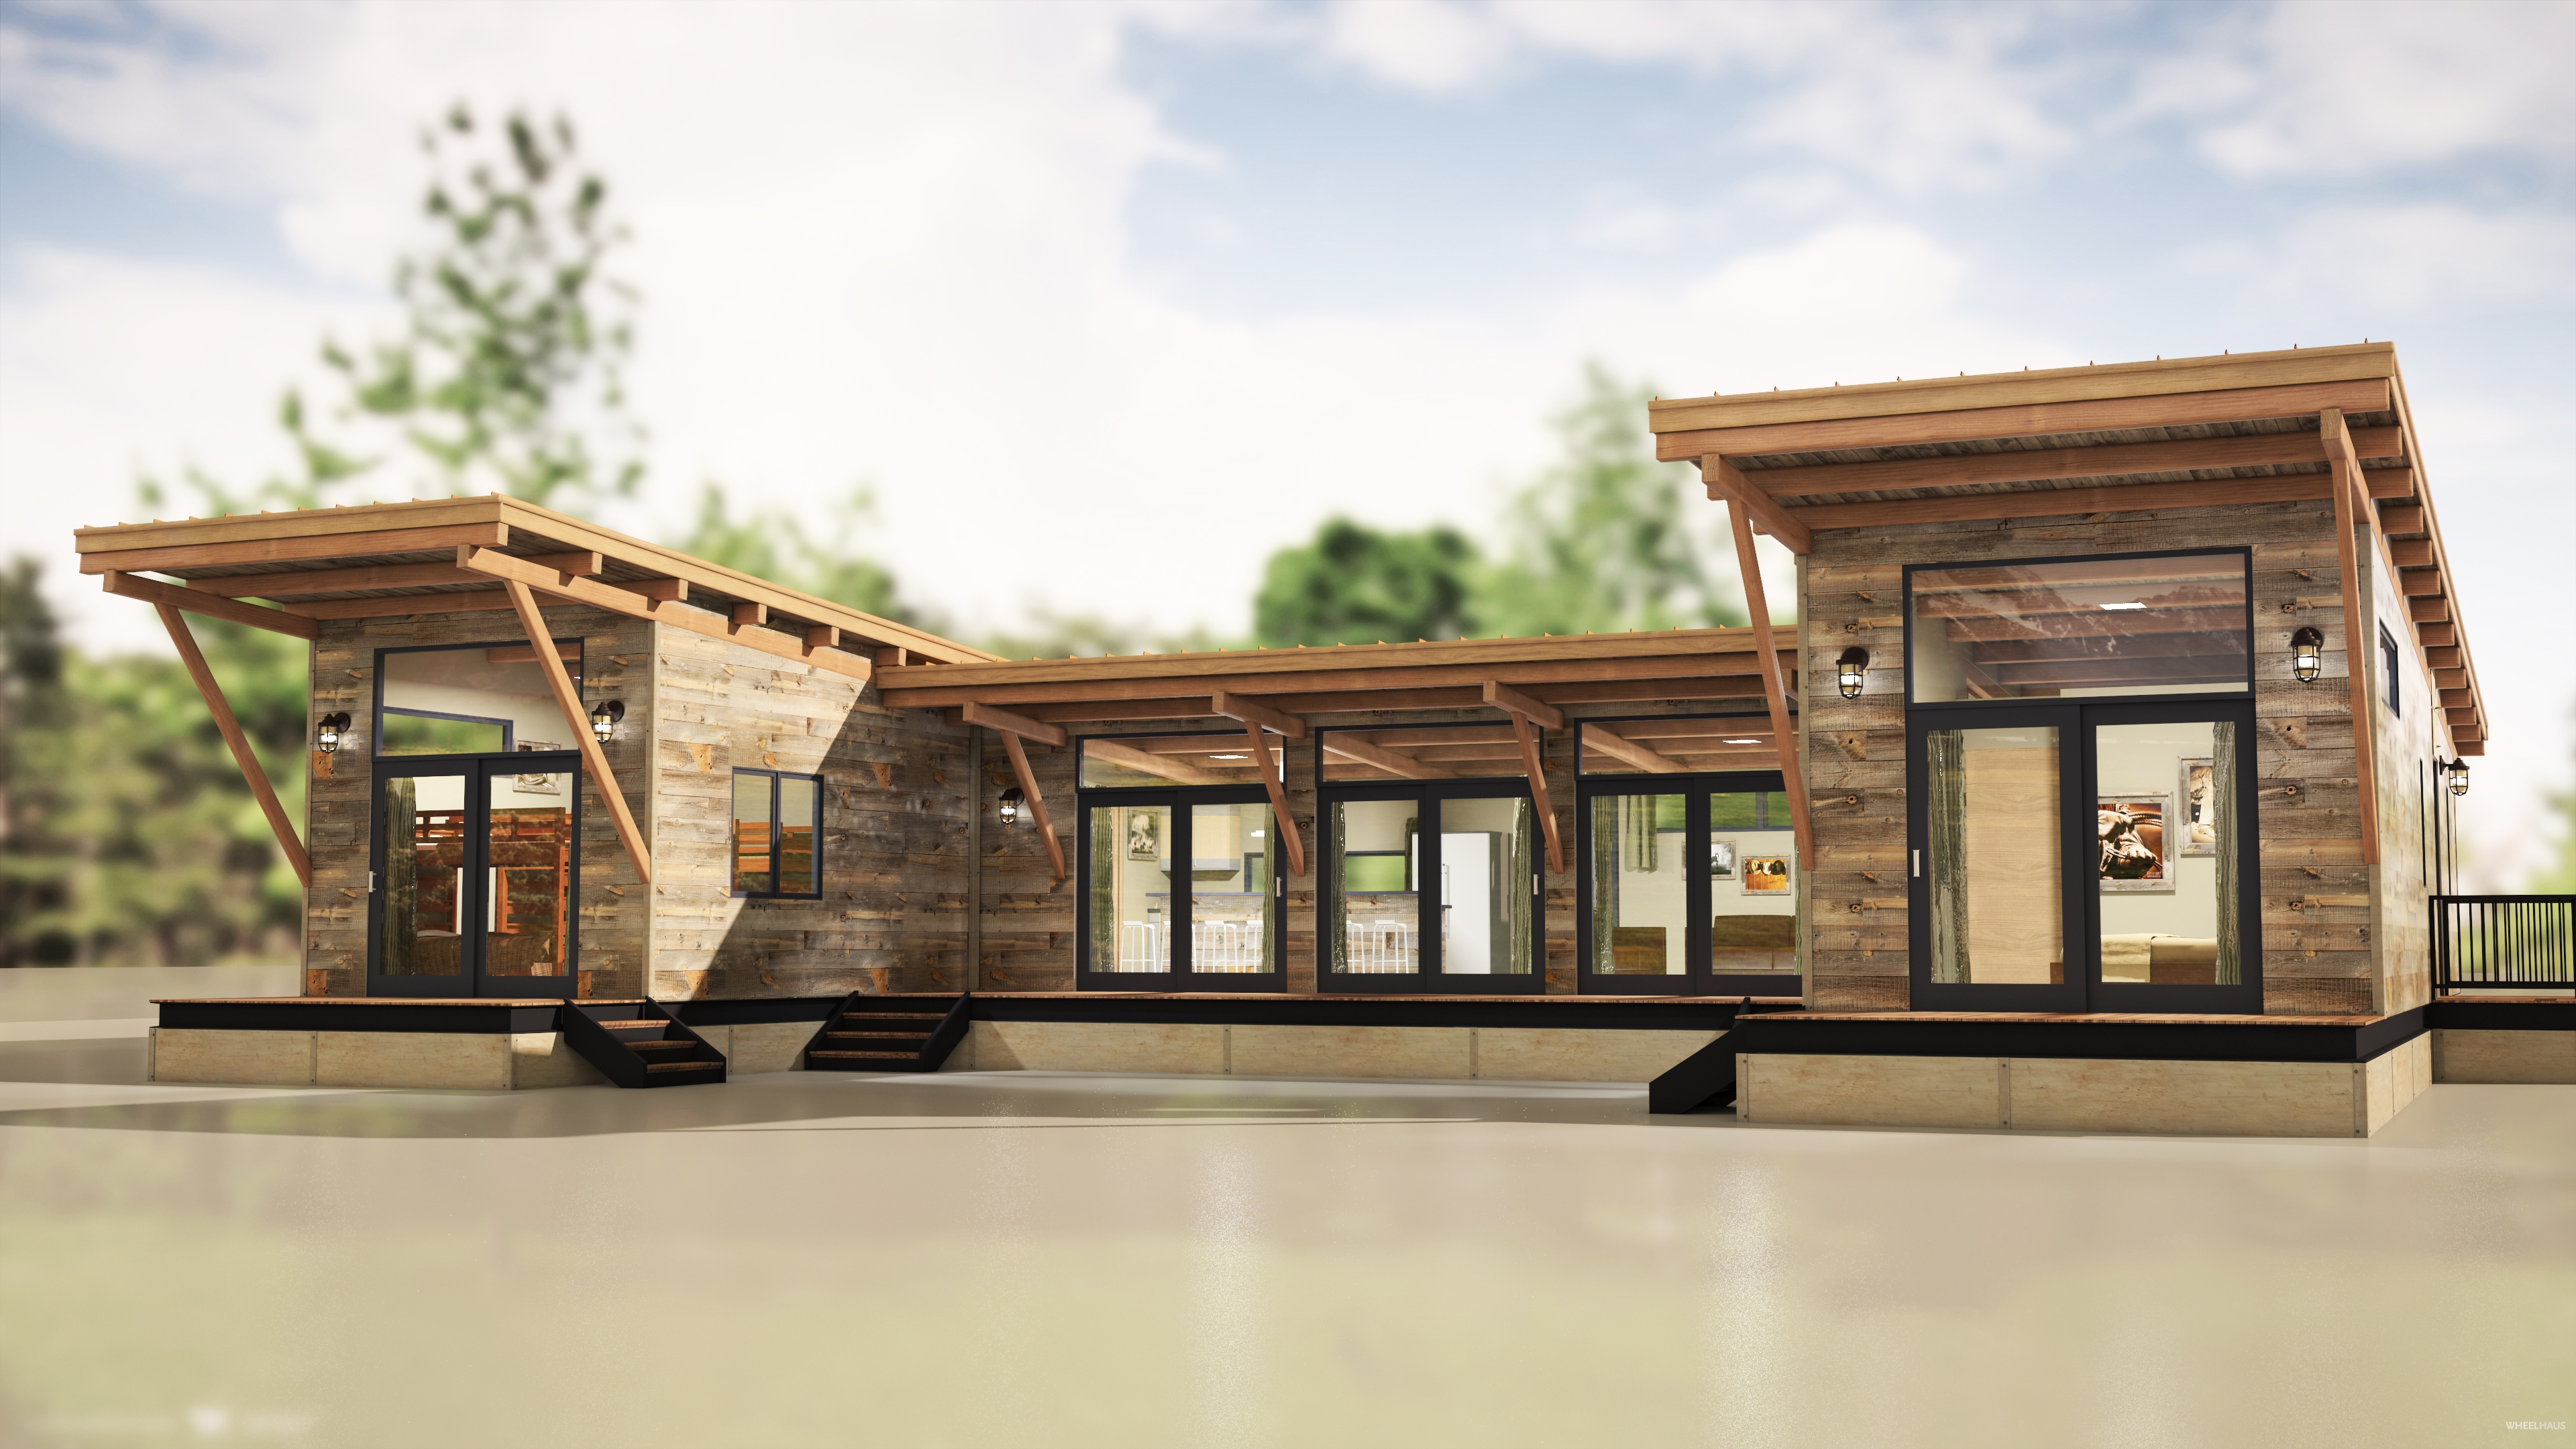 Hitch haus 1500 wheelhaus for Contemporary model homes